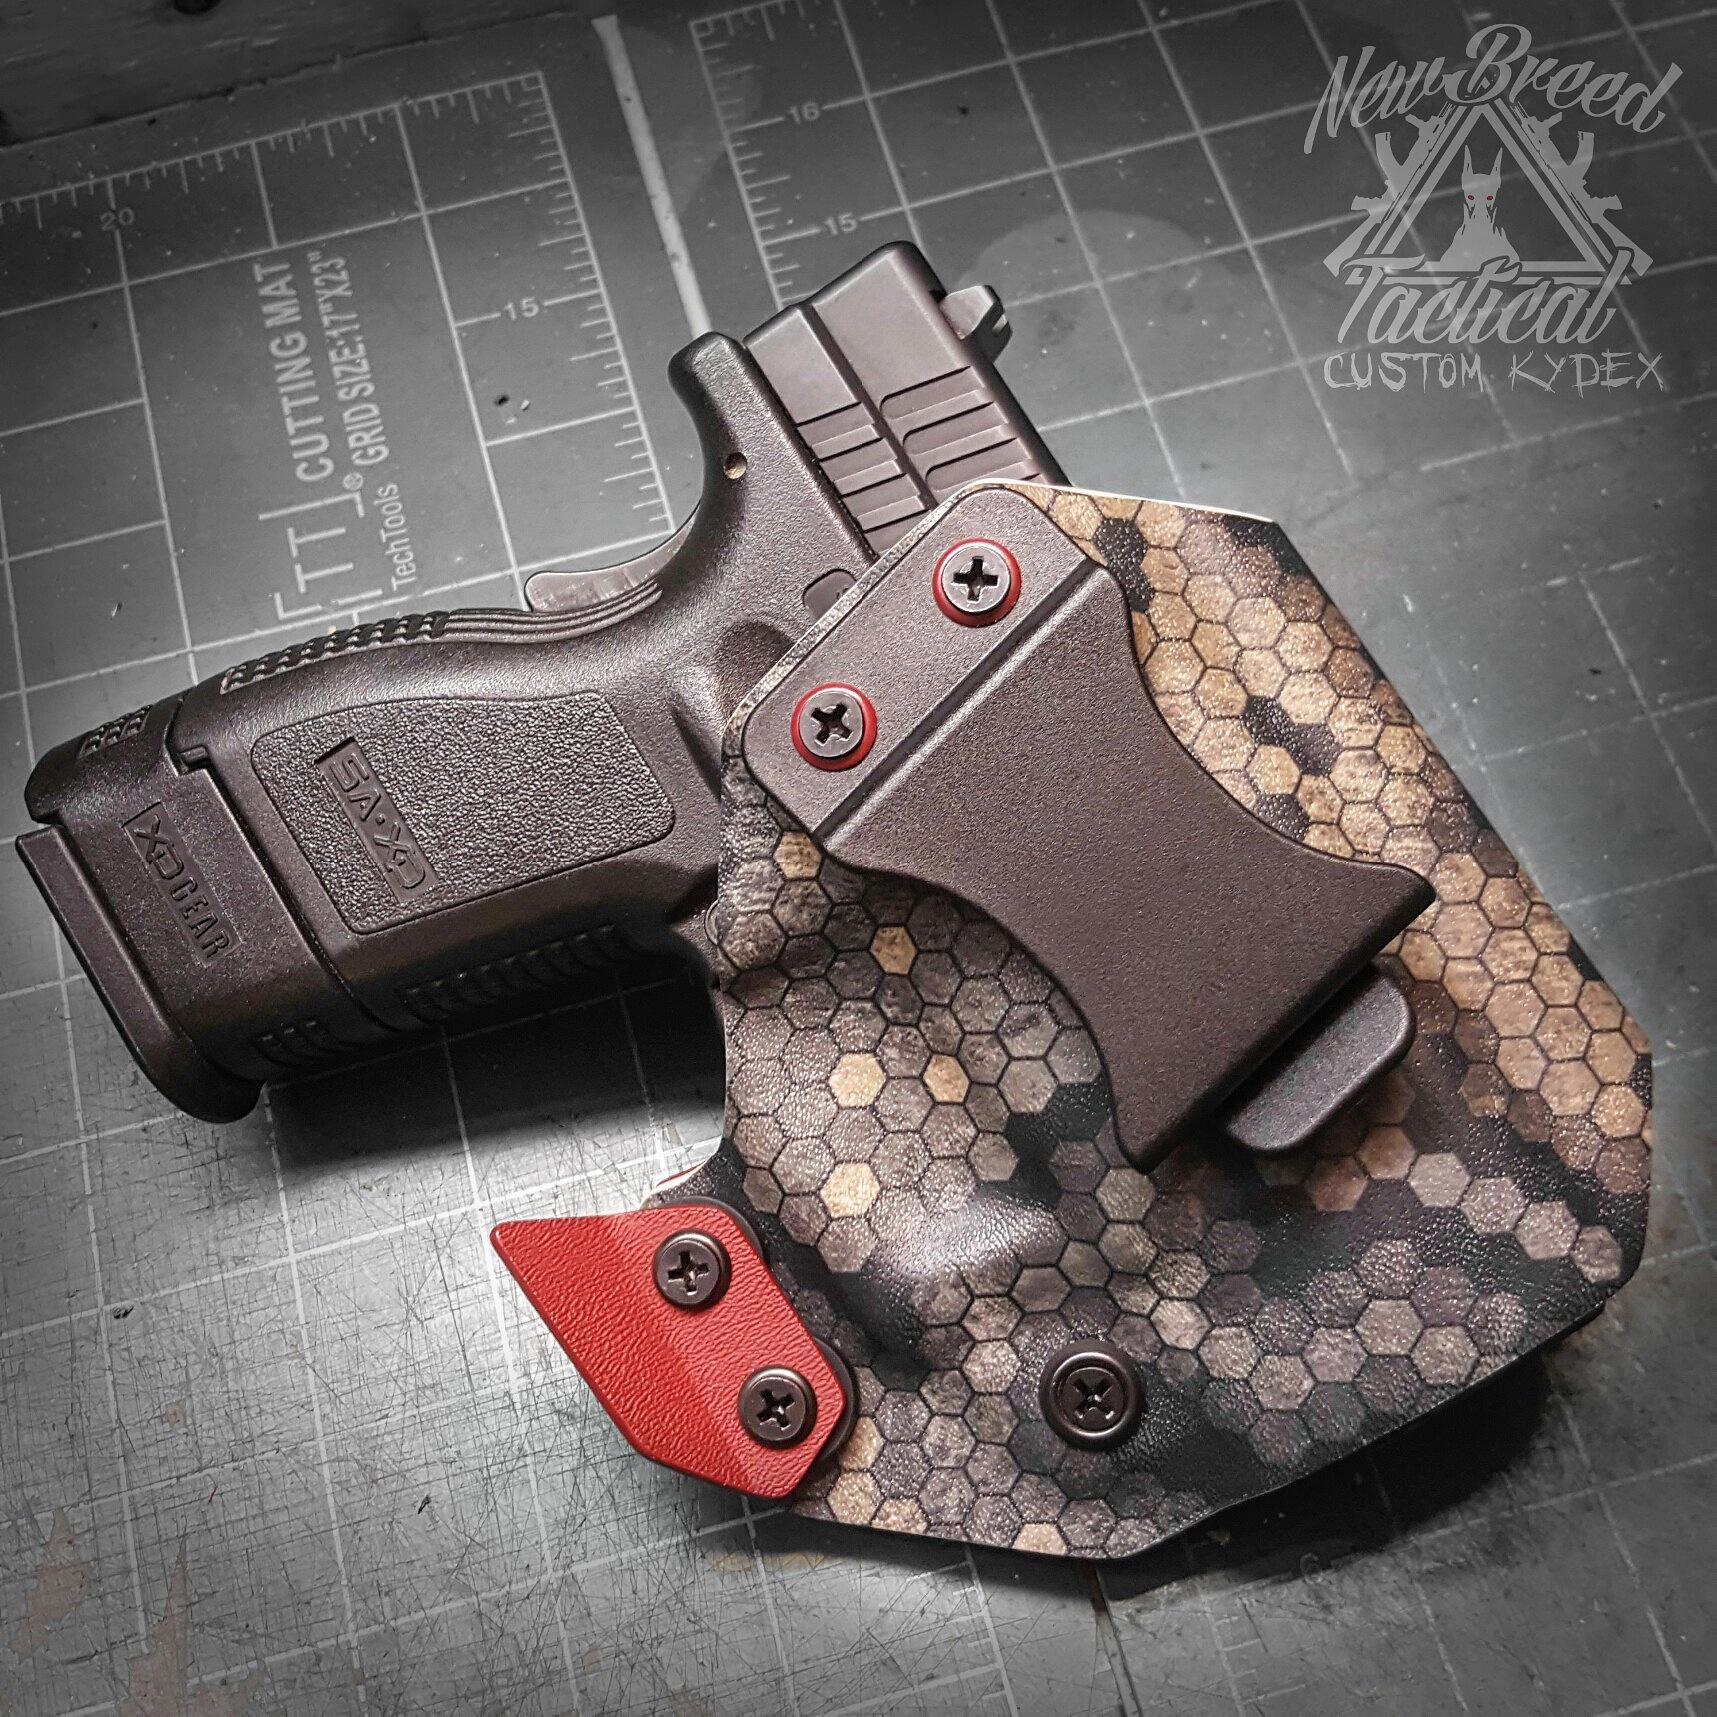 Incisor-XC IWB Holster - New Breed Tactical LLC